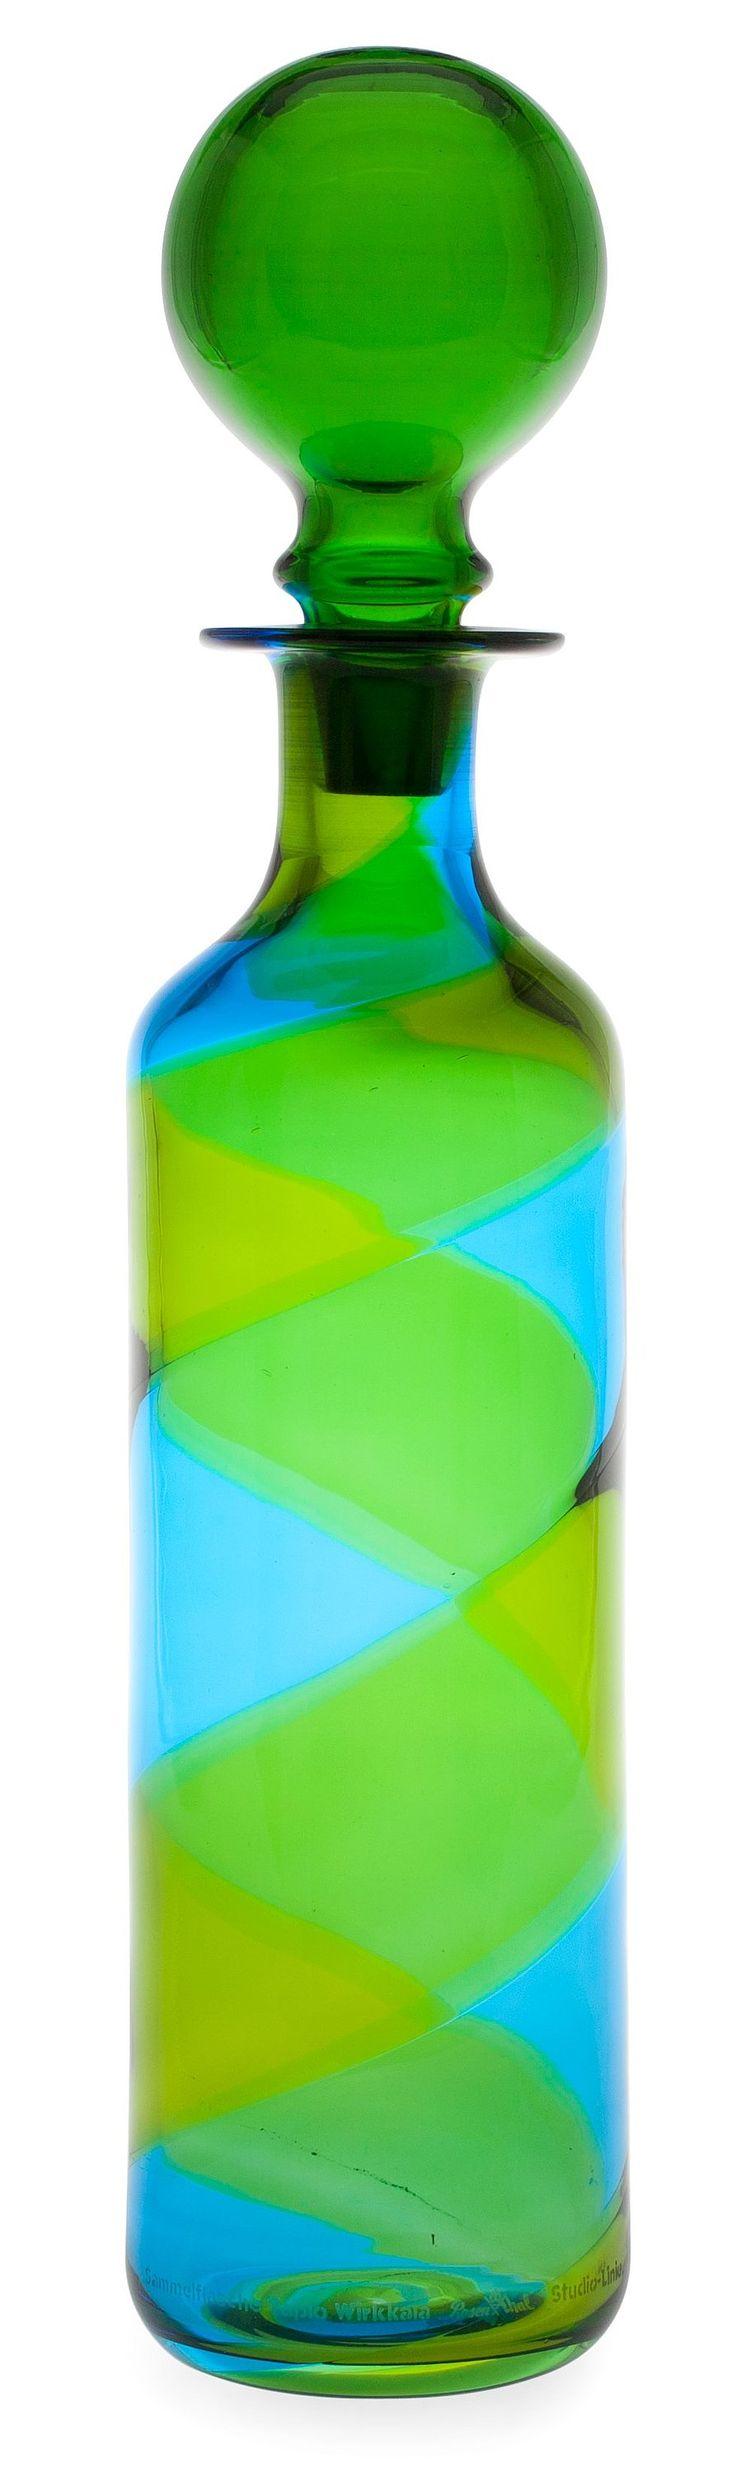 Tapio Wirkkala, Karaff. Art glass green blue